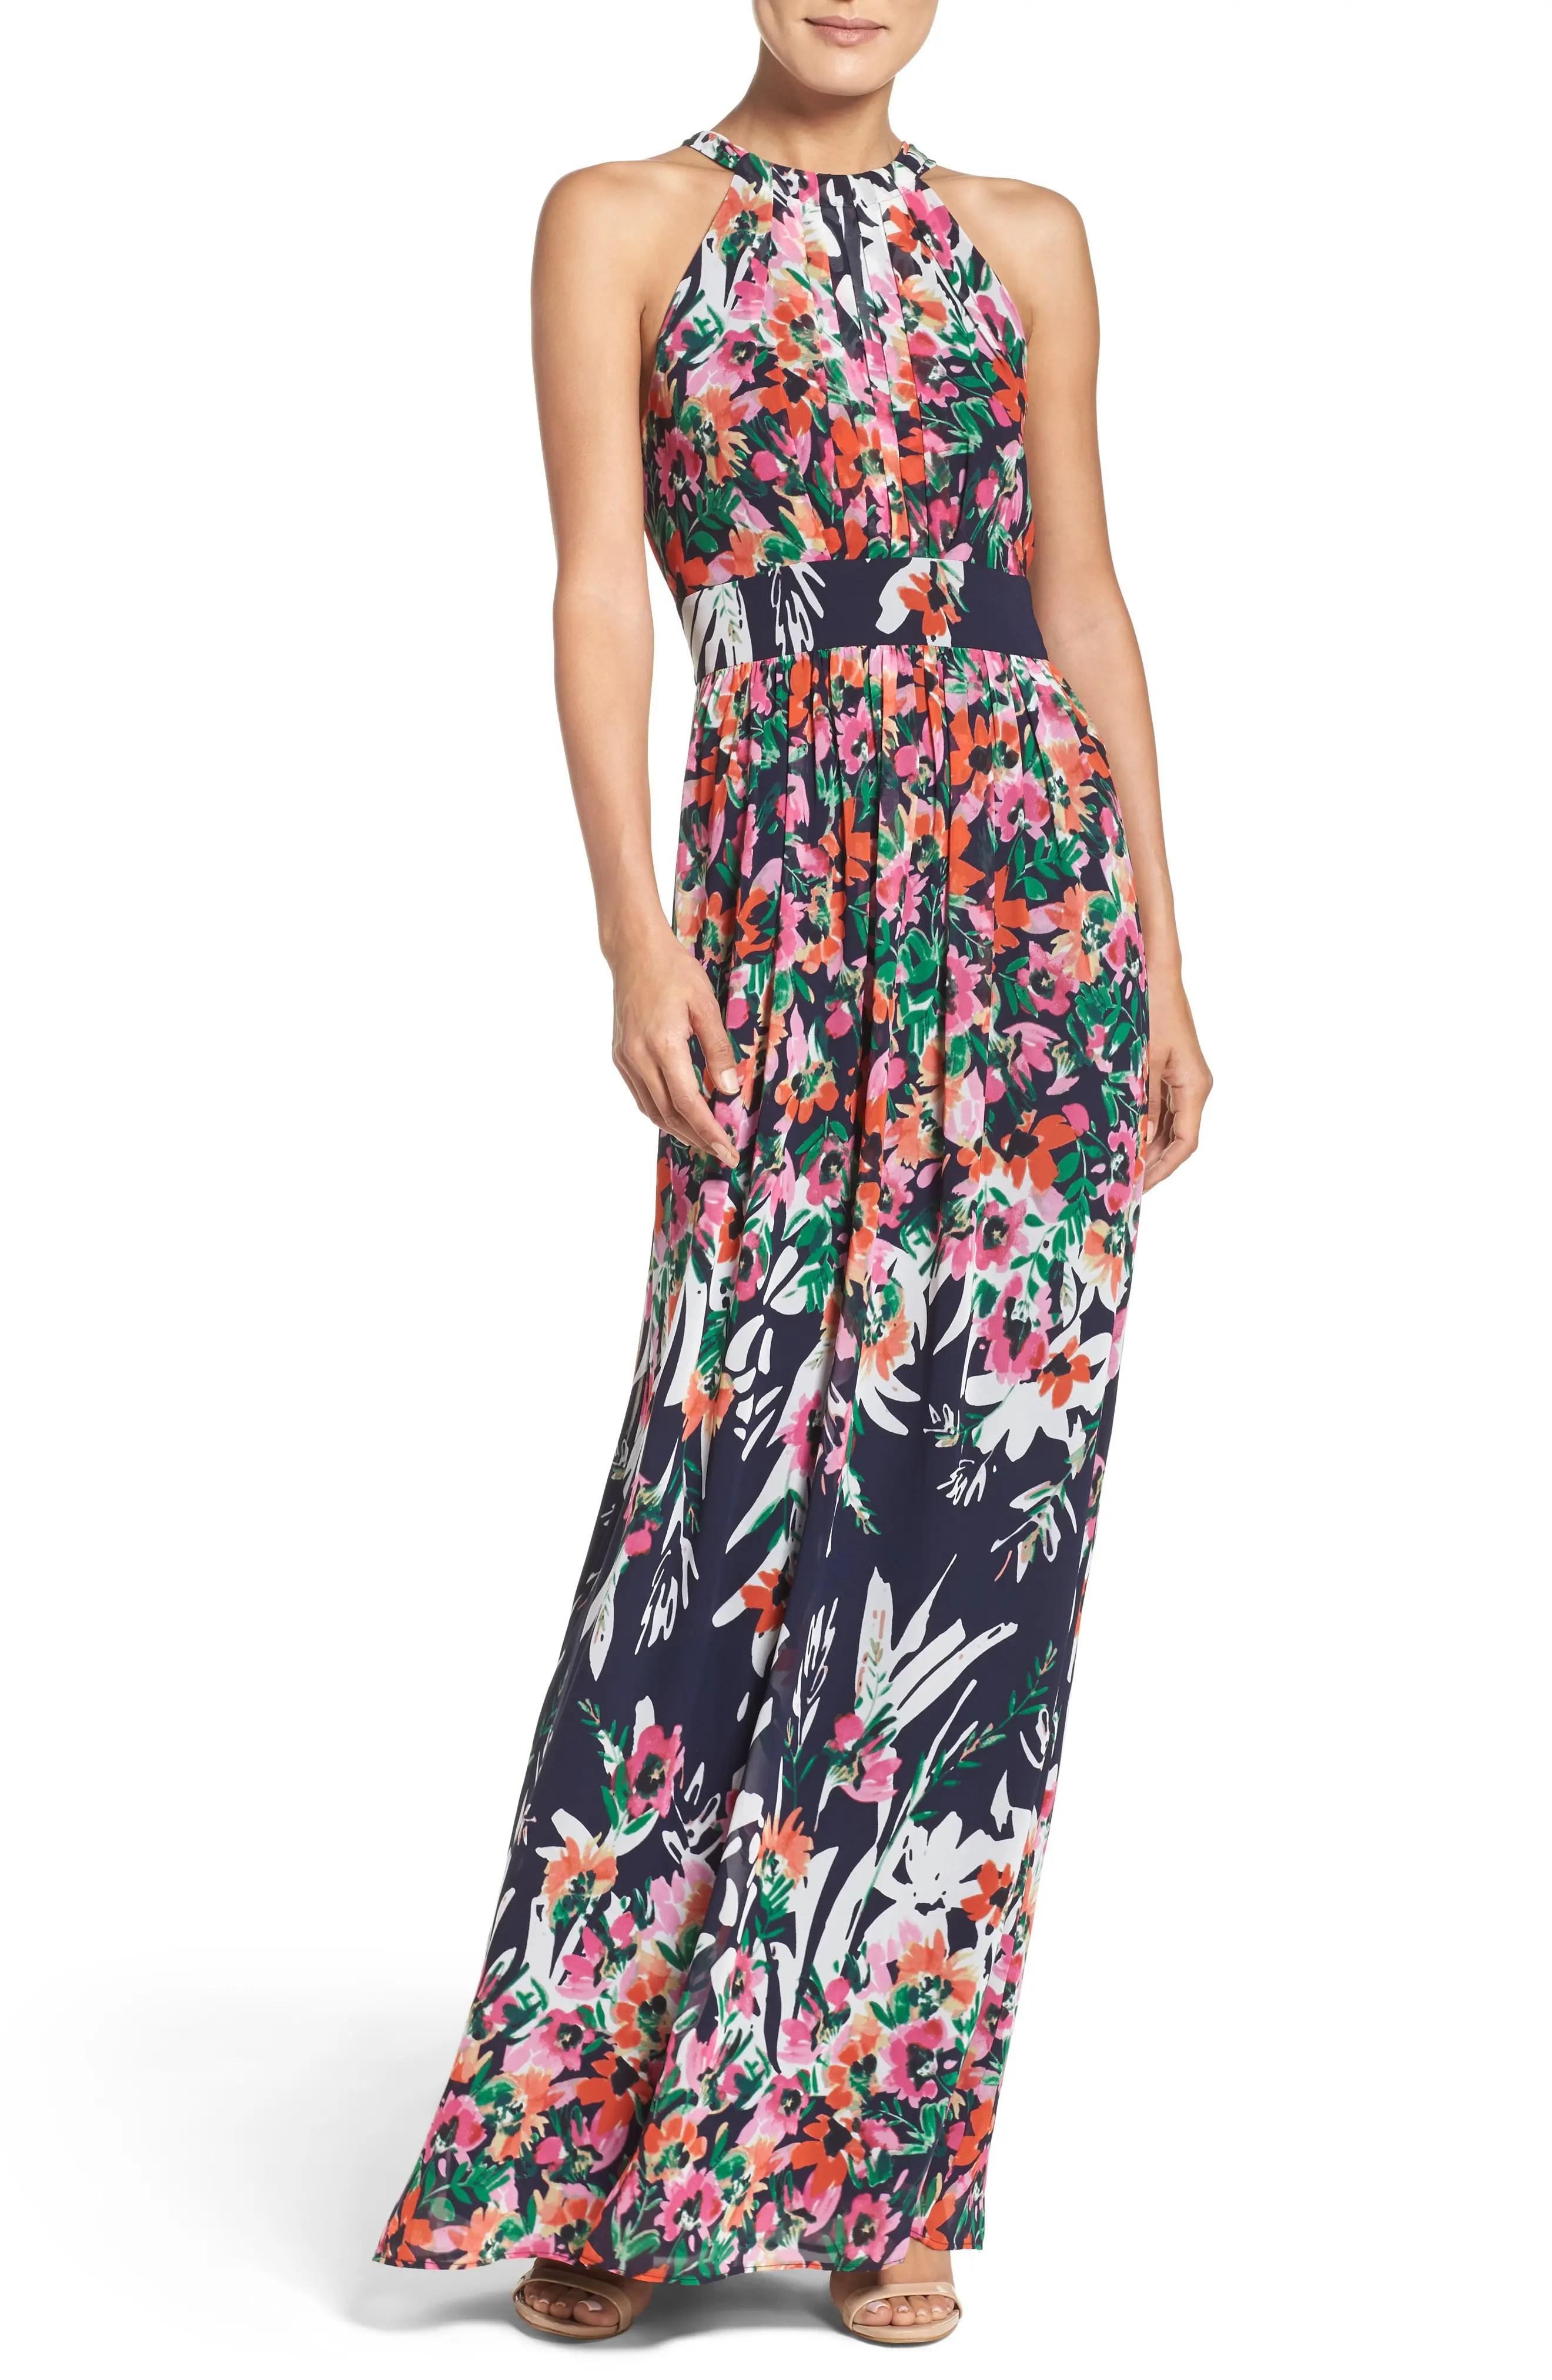 Eliza  floral print chiffon halter maxi dress also women   dresses nordstrom rh shoprdstrom